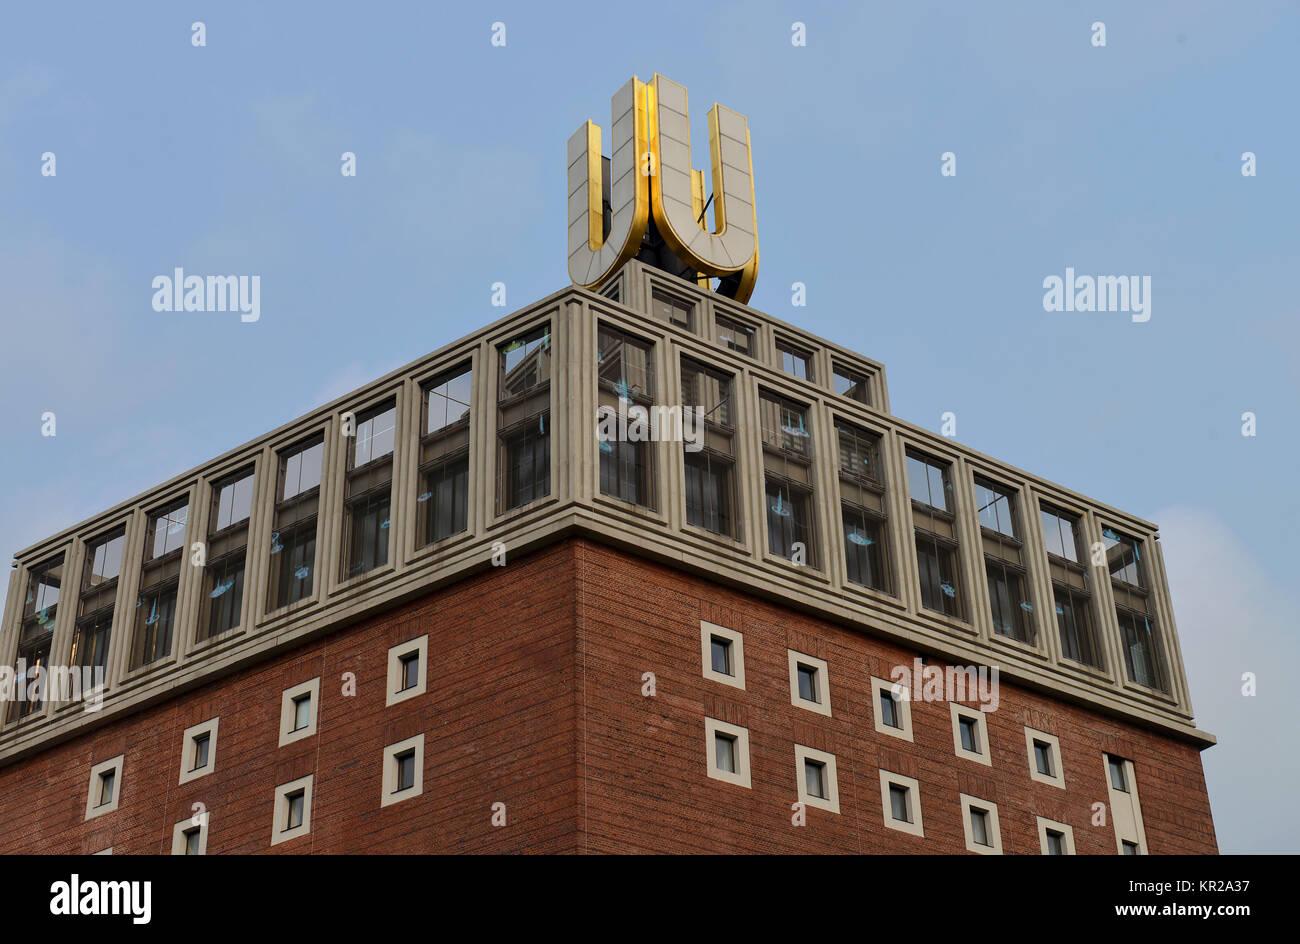 Dortmund U, Leonie Reygers terrace, Dortmund, North Rhine-Westphalia, Germany, Dortmunder U, Leonie-Reygers-Terrasse, - Stock Image